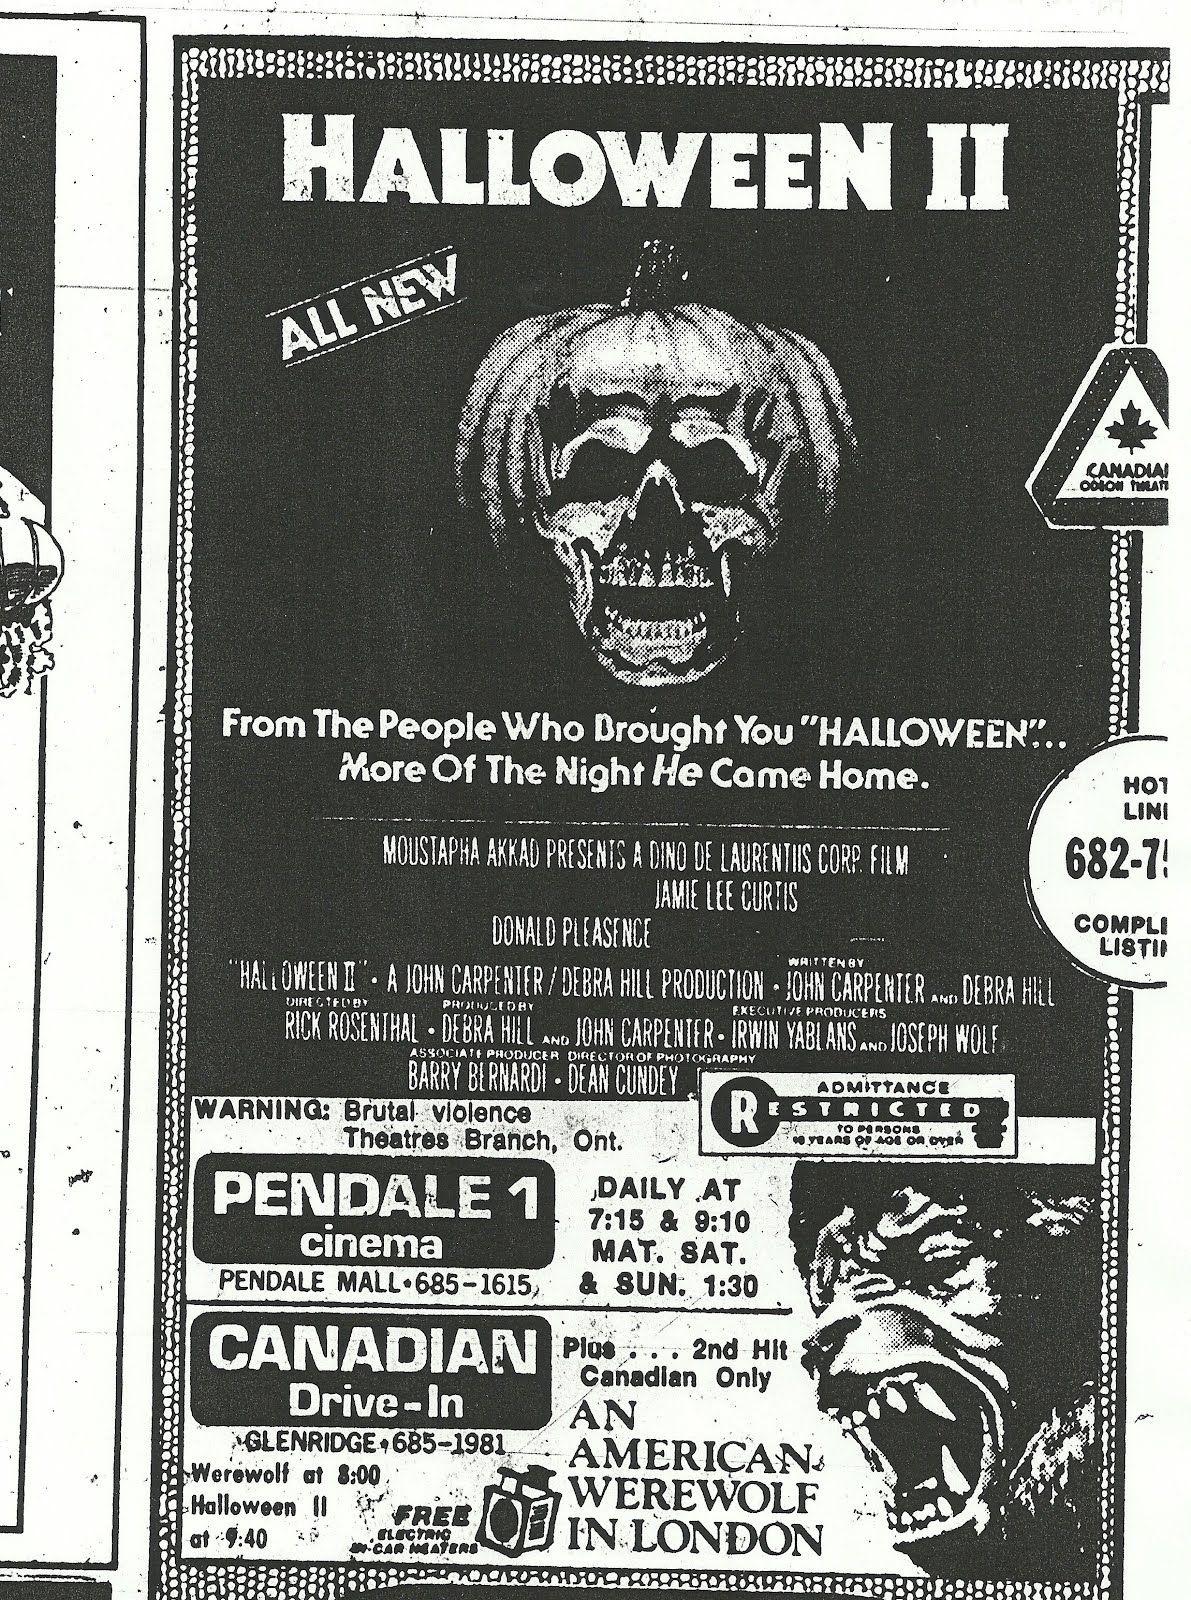 Halloween 2 an american werewolf in london 1981